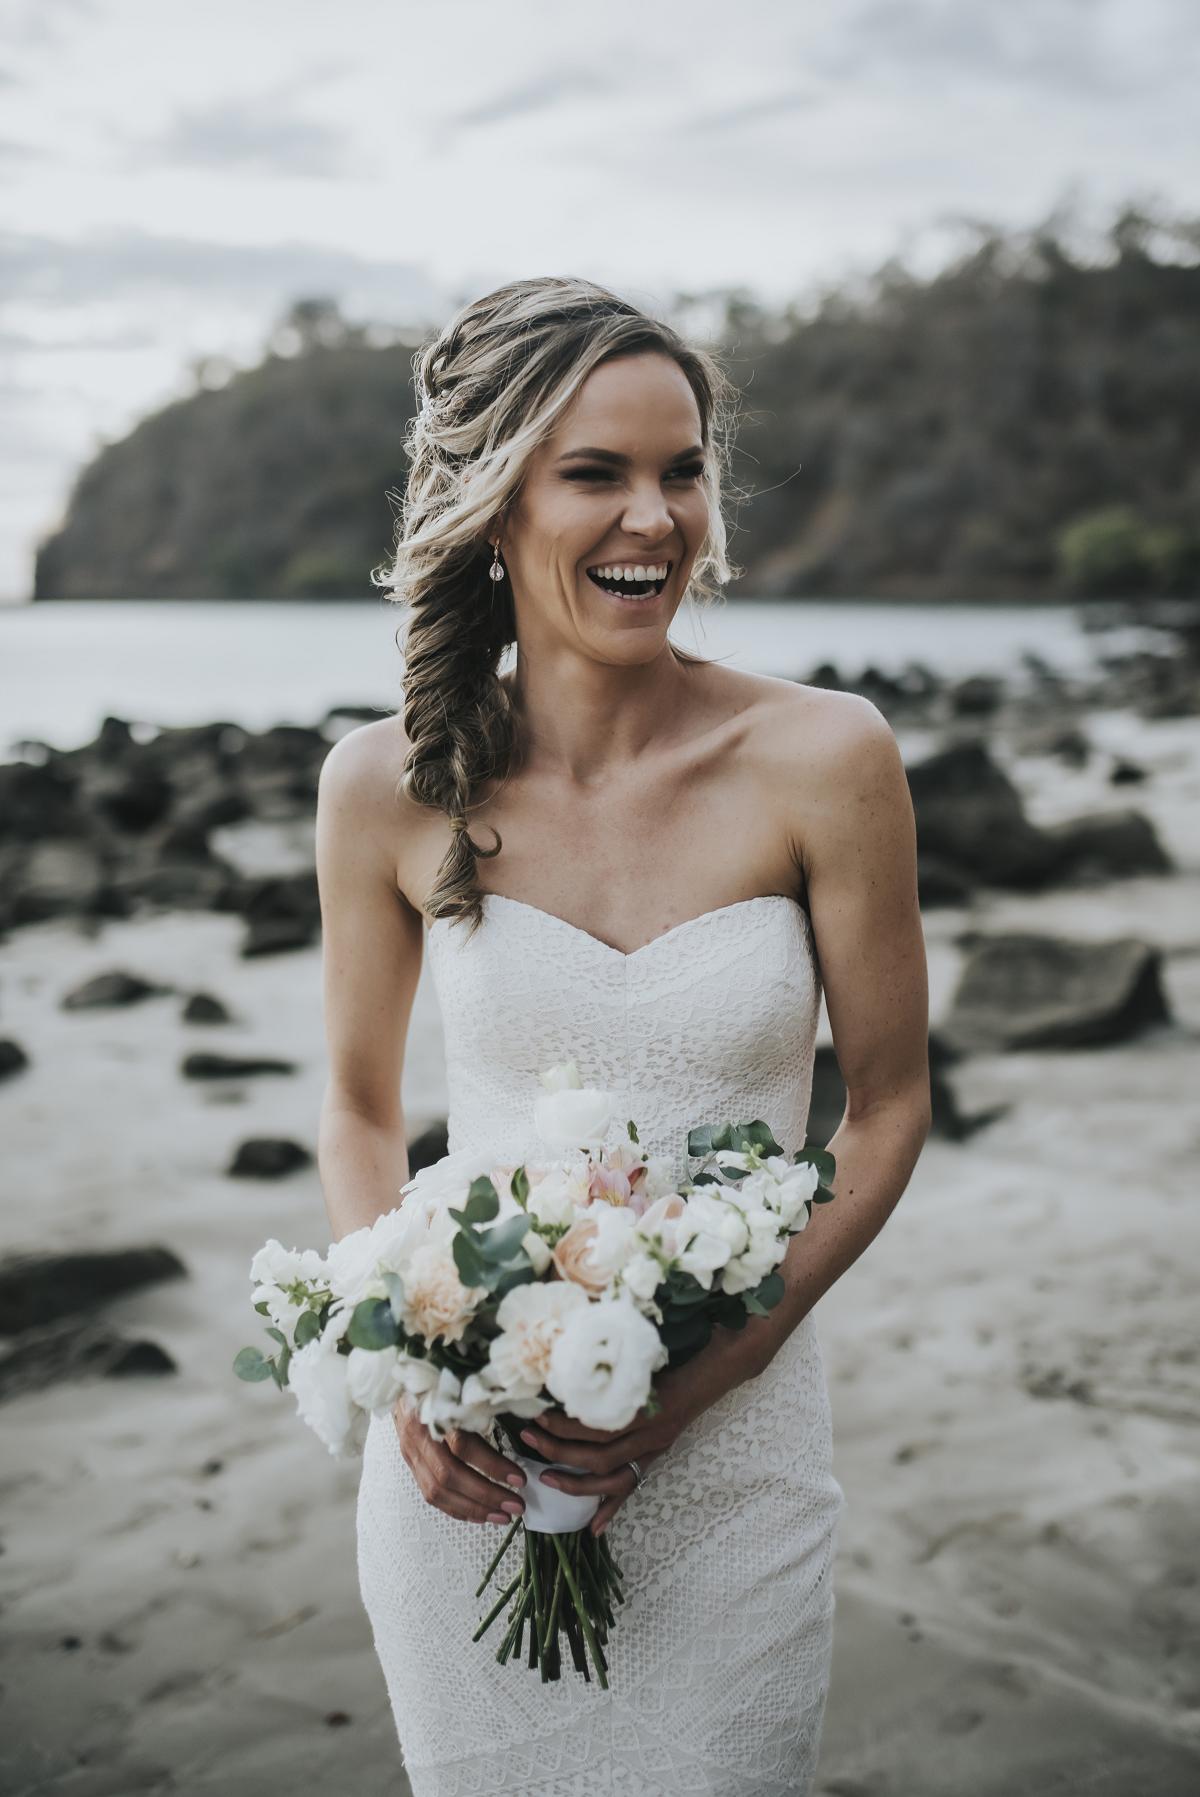 Costa Rica Destination Wedding Photographer | Wedding Photographer Costa Rica